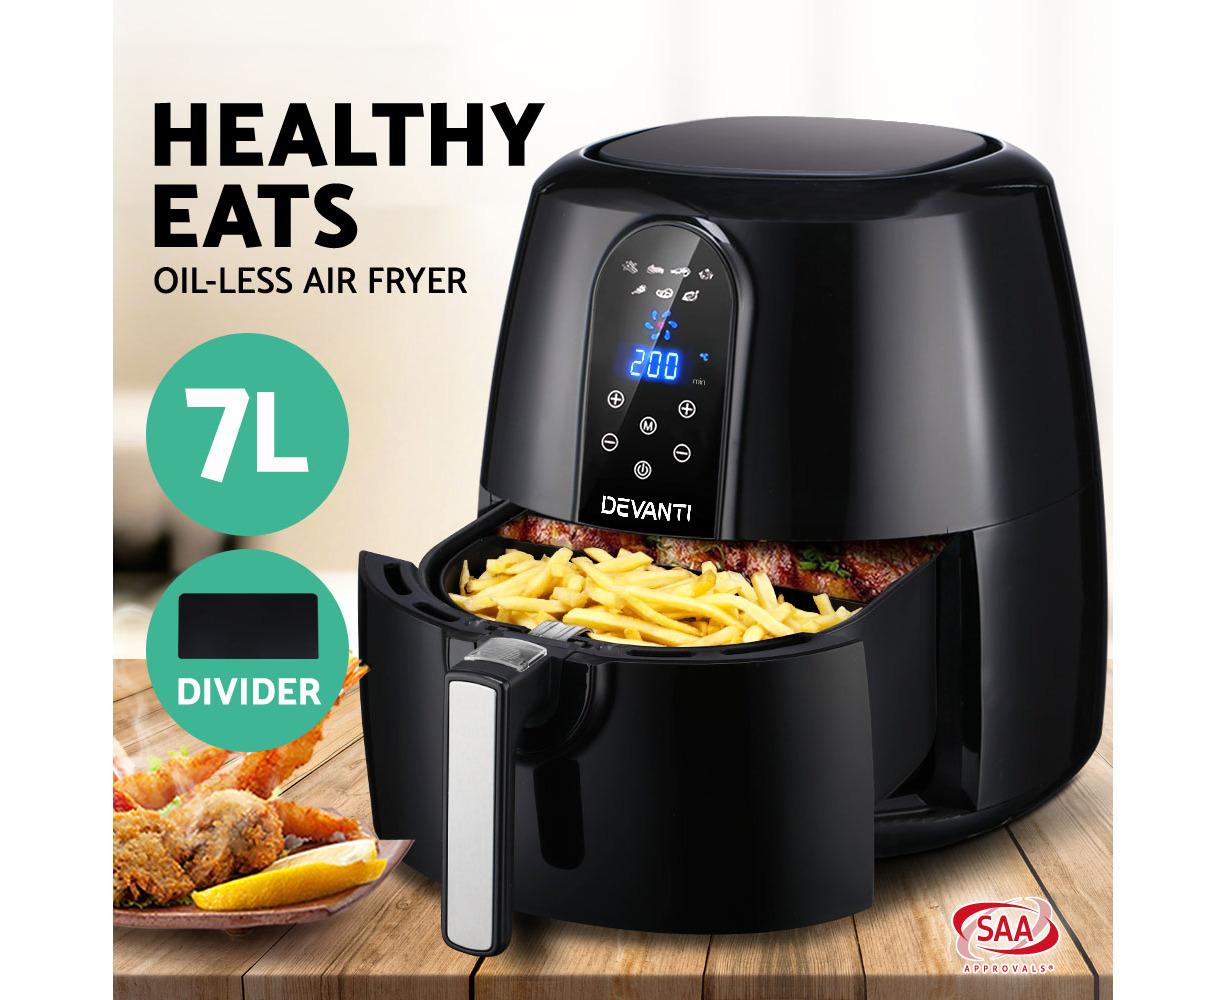 Devanti 7l Air Fryer Lcd Healthy Cooker Oil Free Kitchen Oven Airfryer 1800w Catch Com Au